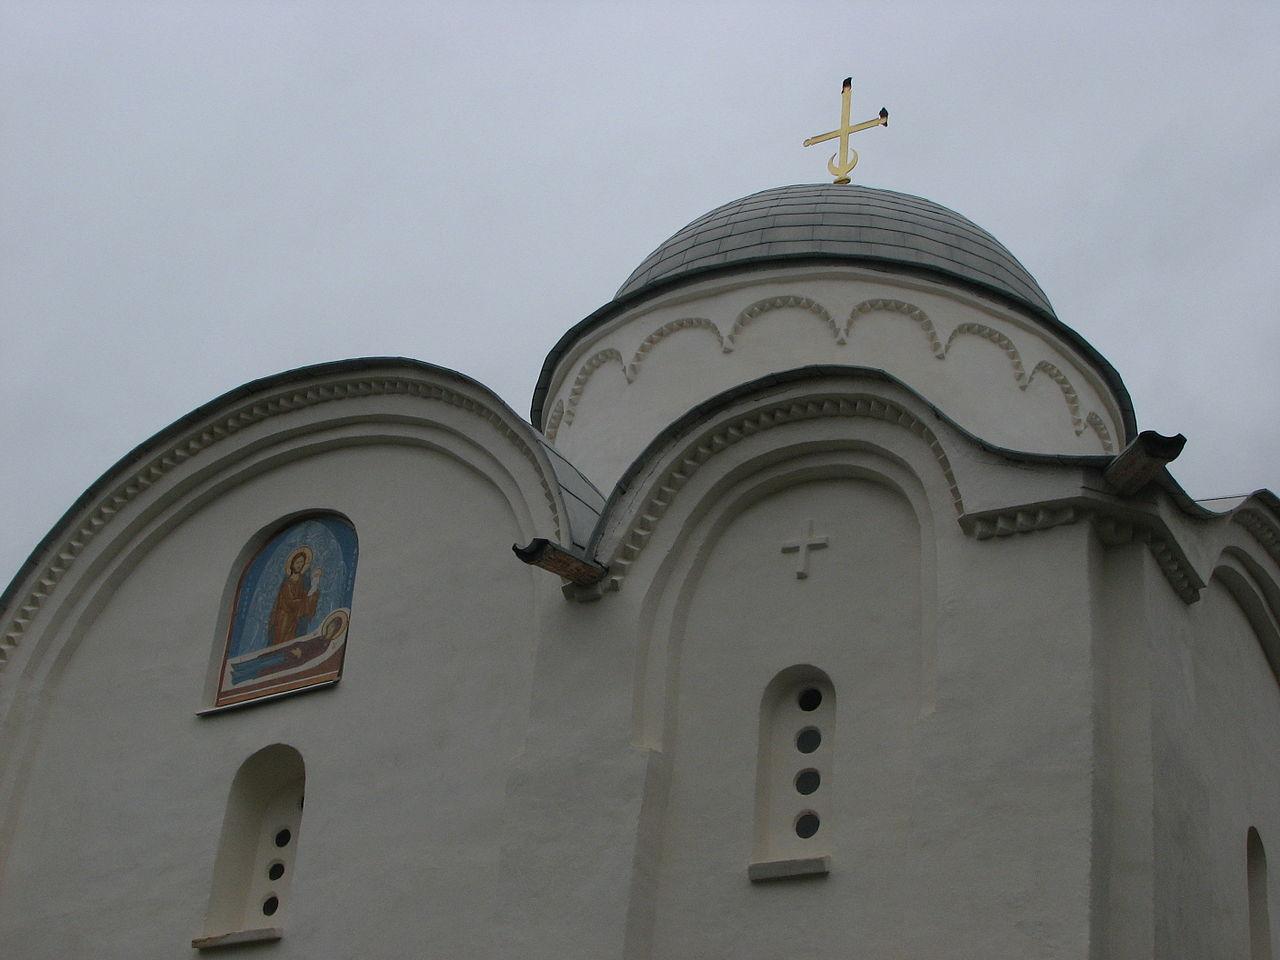 Староладожский Успенский монастырь, деталь фасада